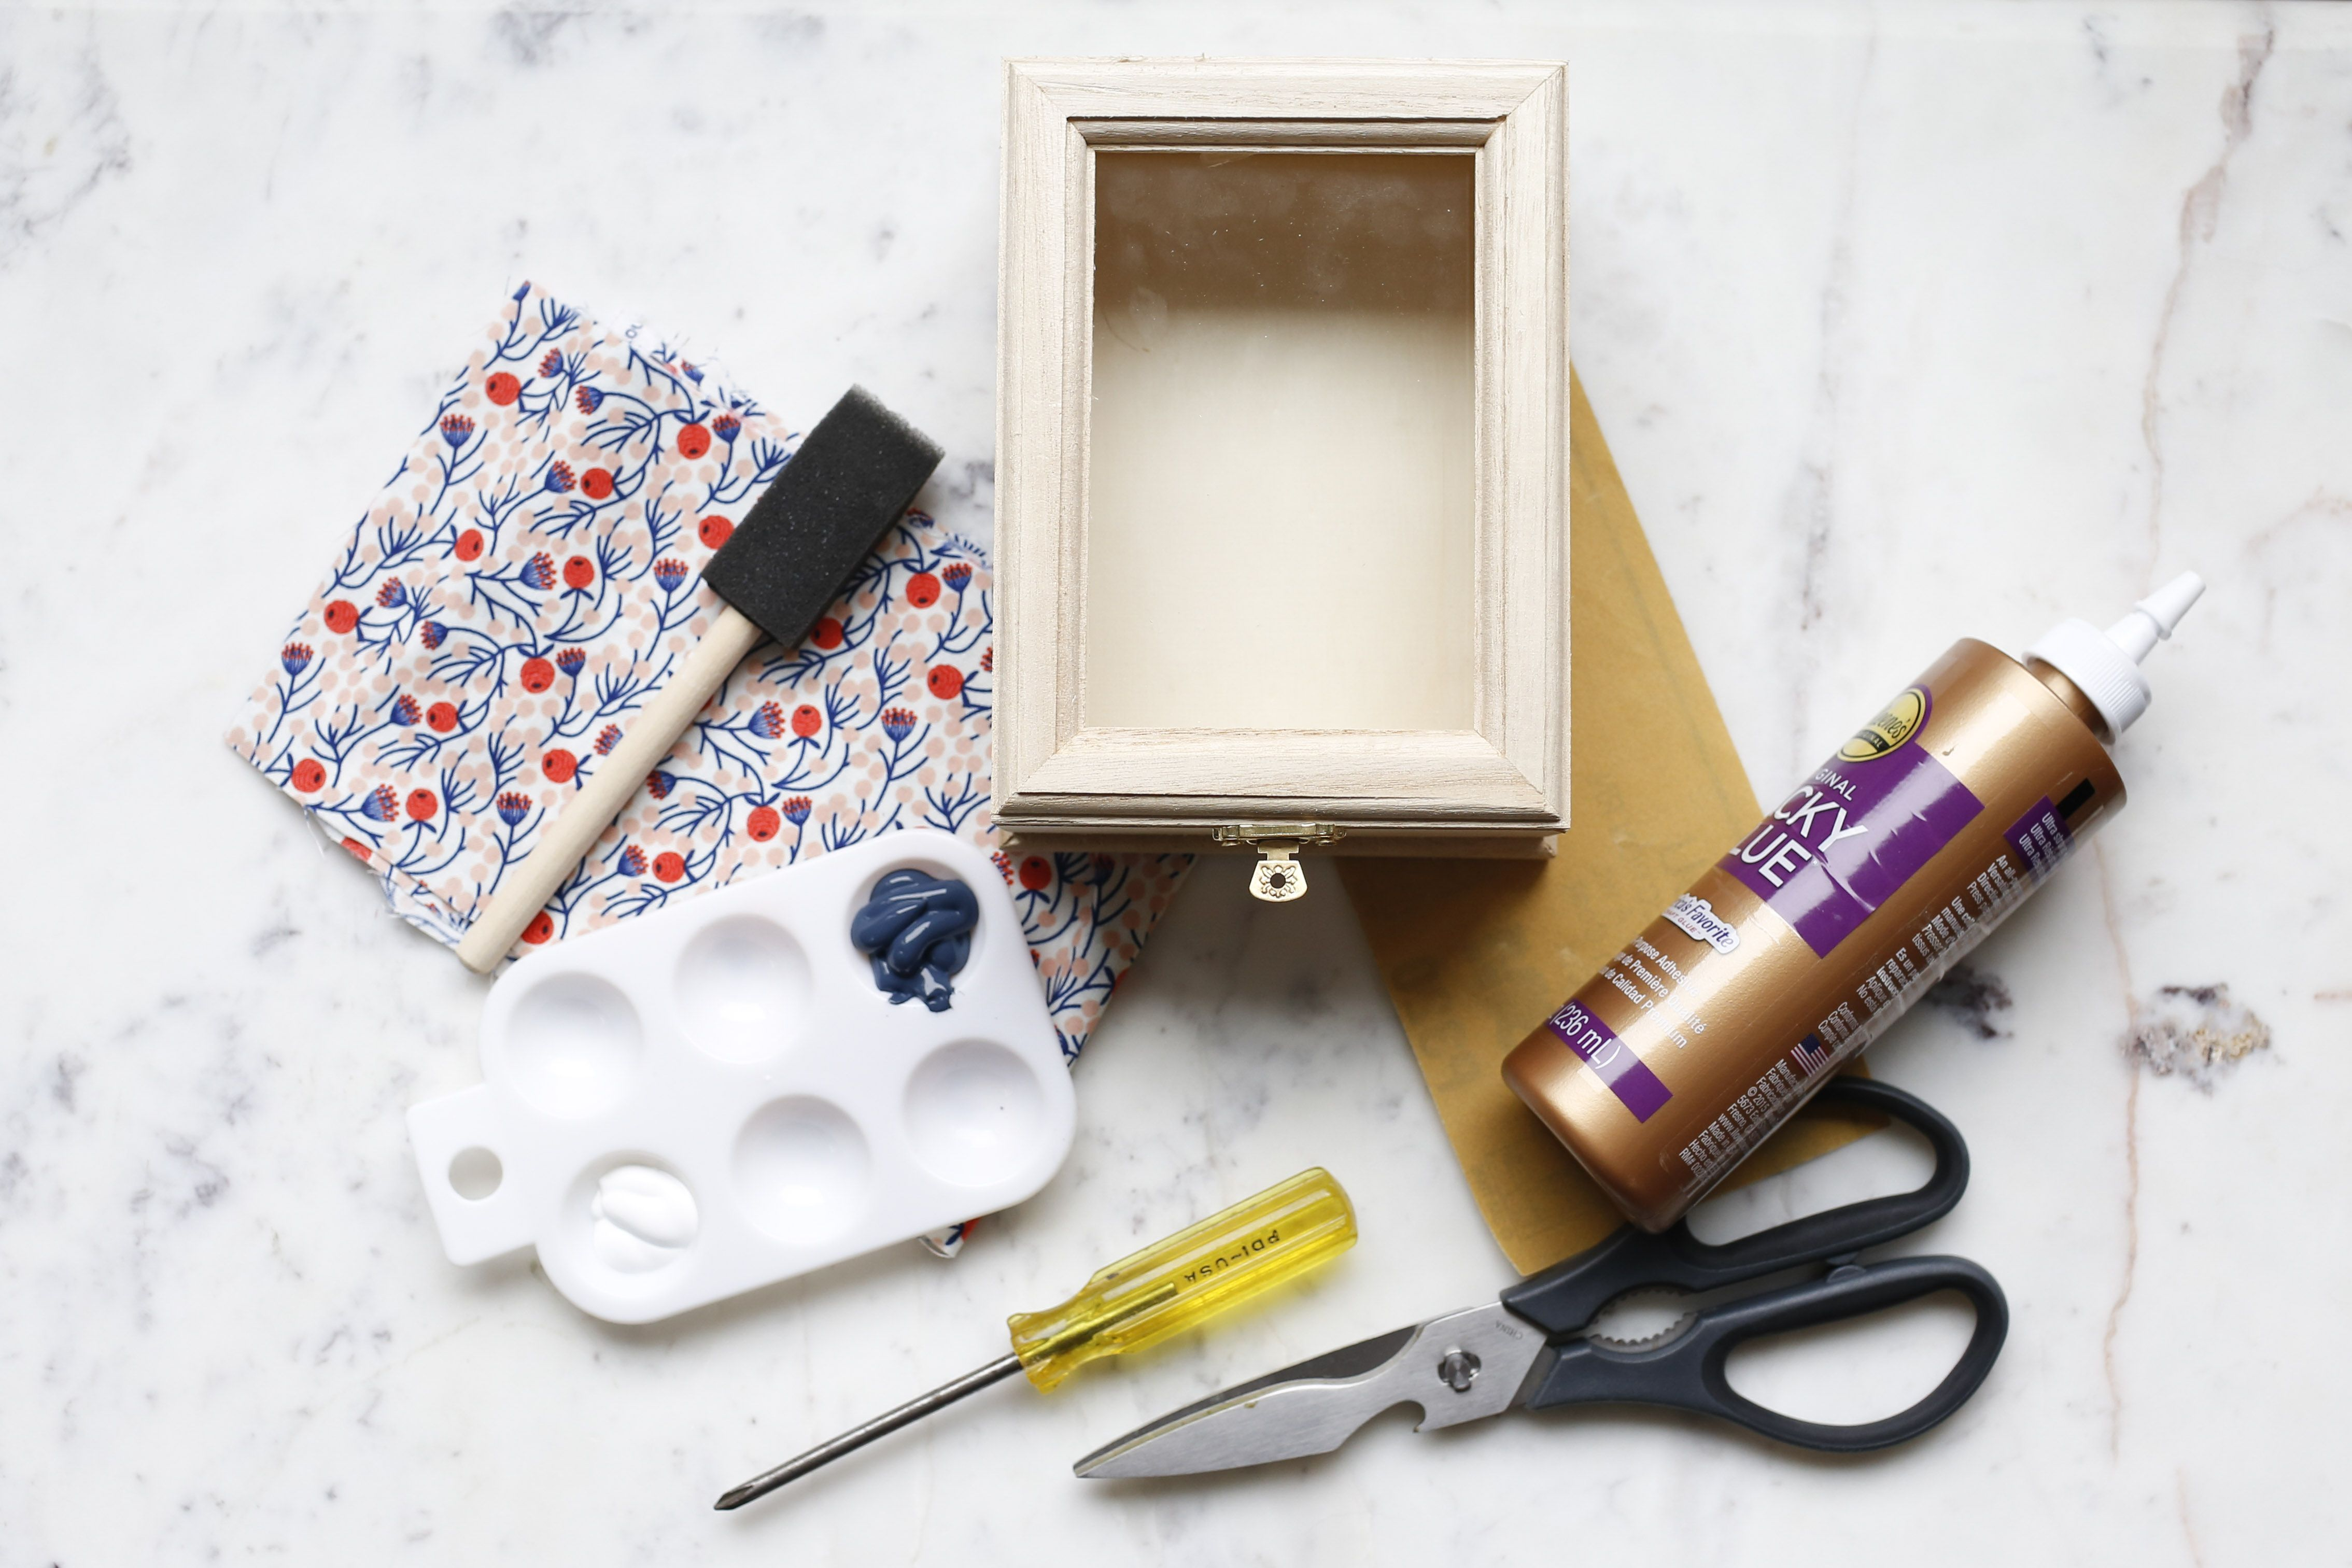 Jewelry box materials